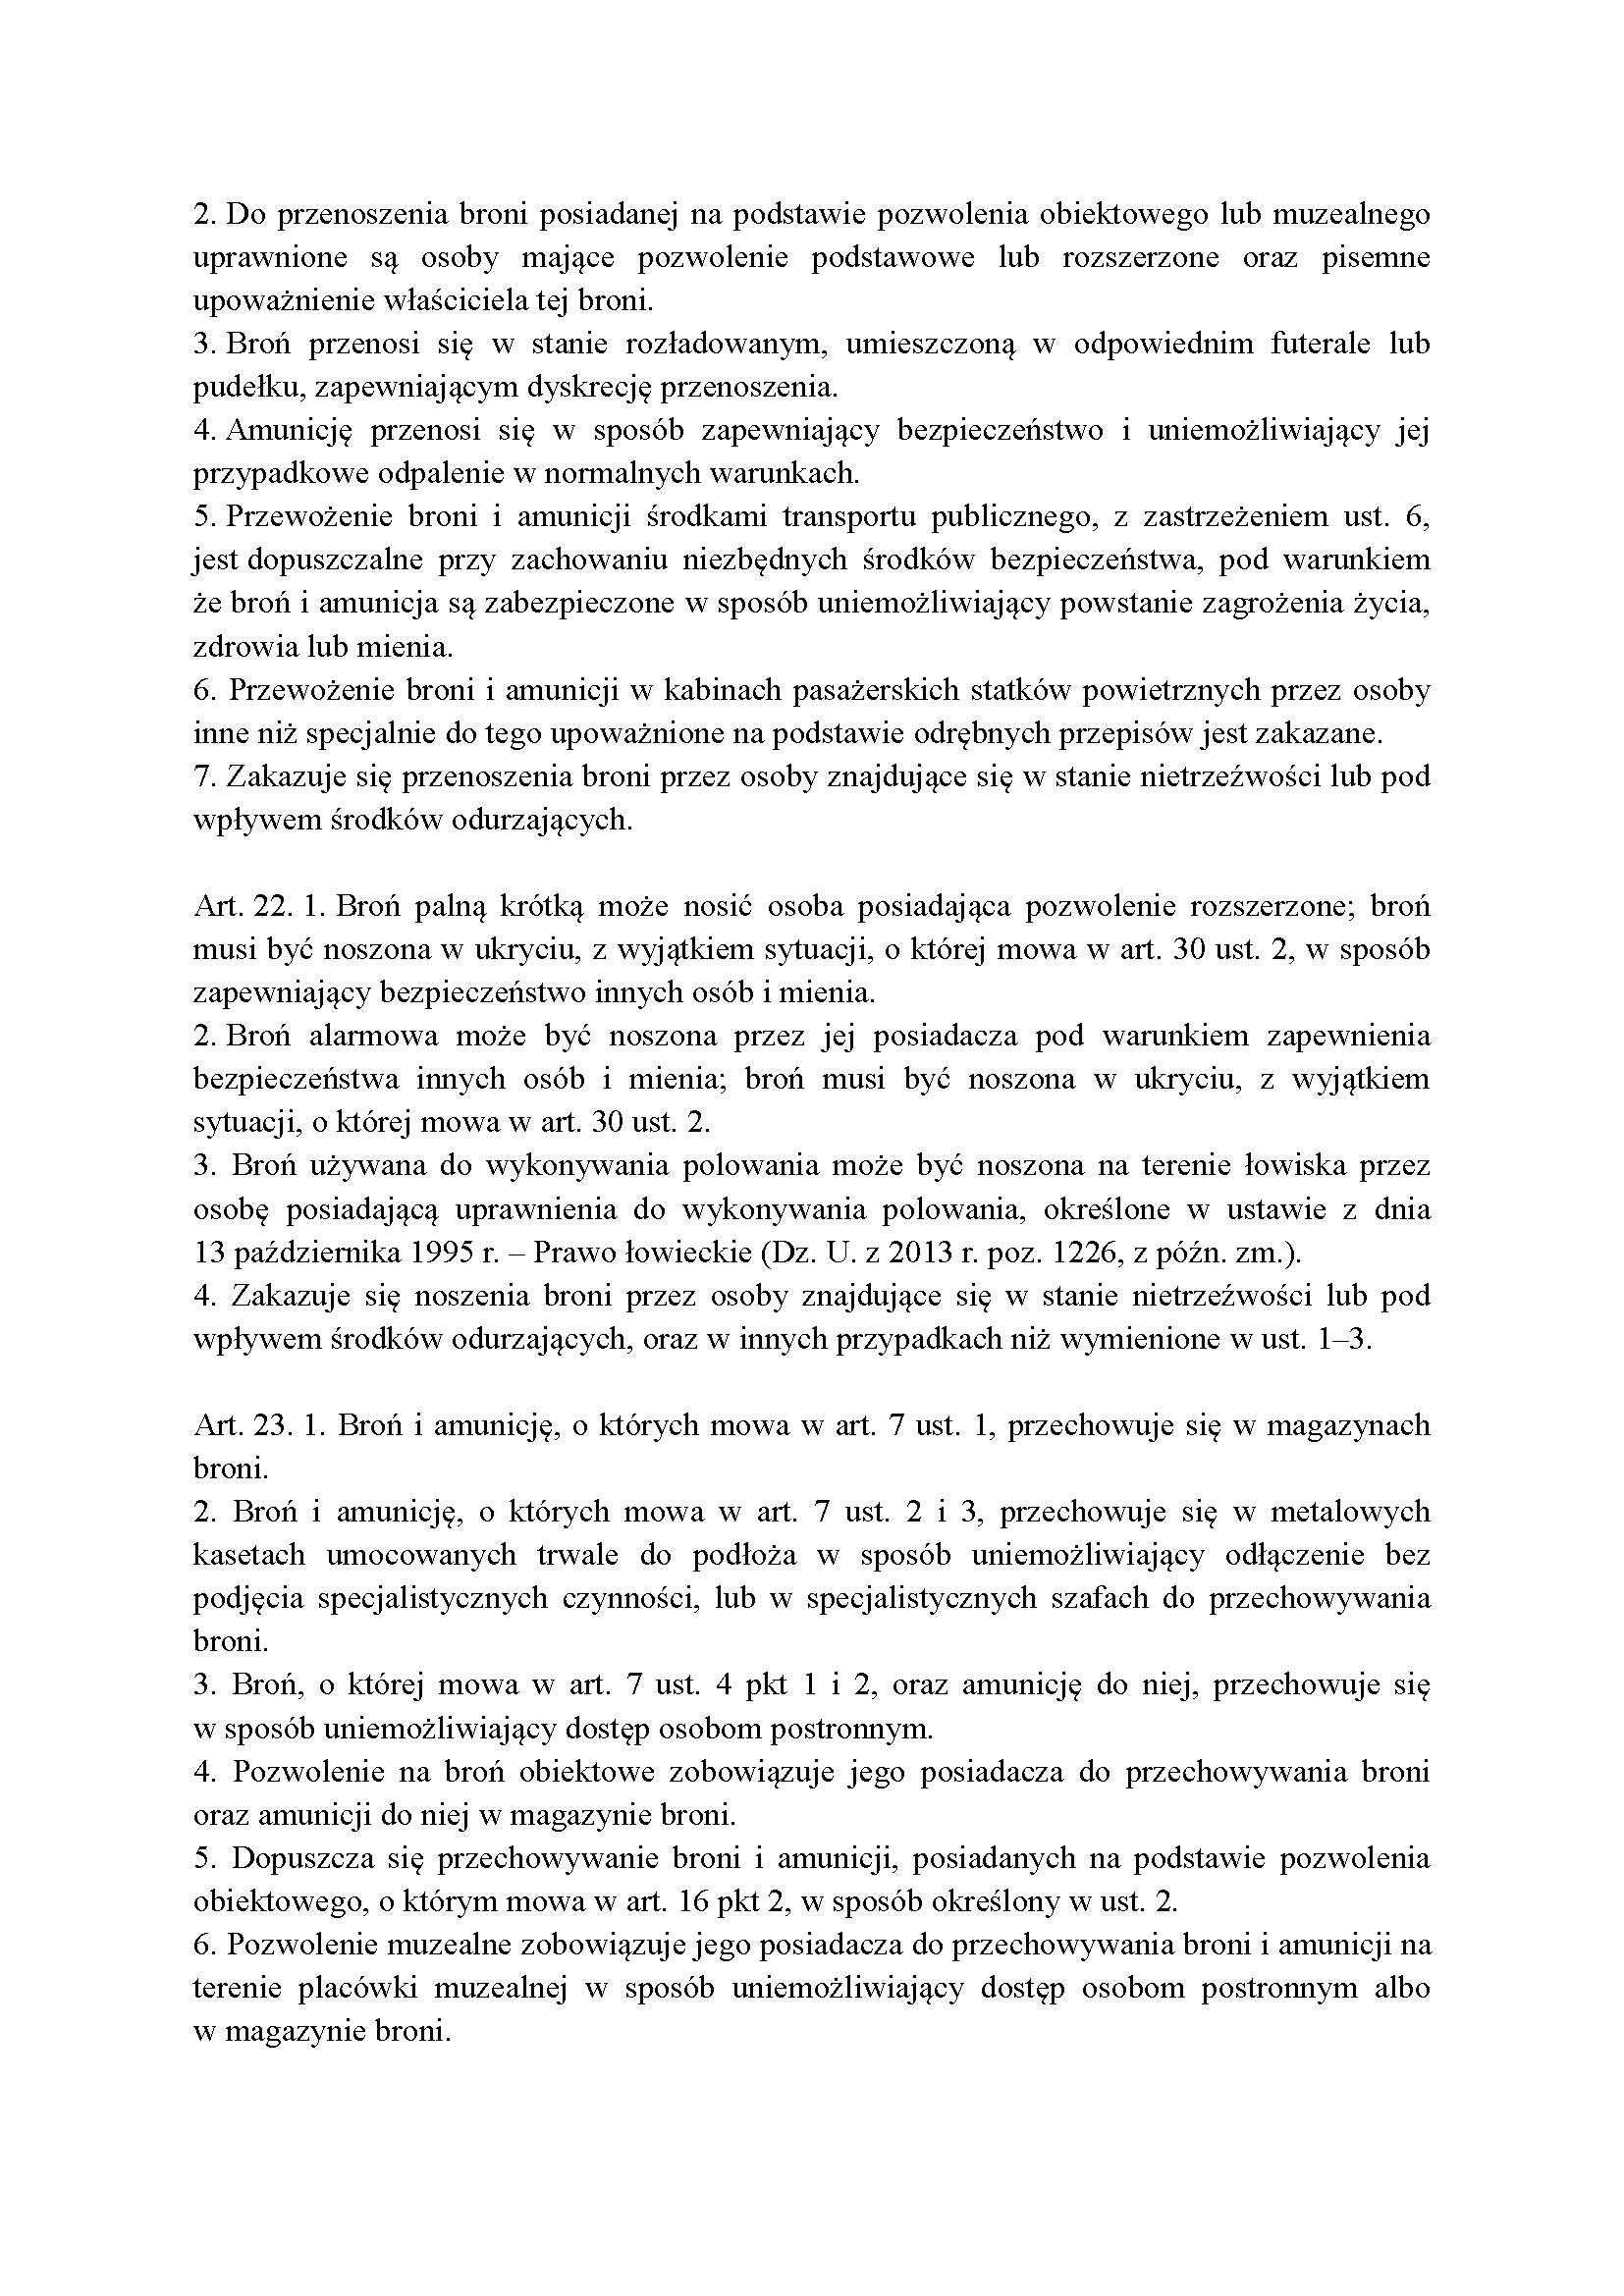 FRSwP_projekt_ustawy_20151125_Strona_11